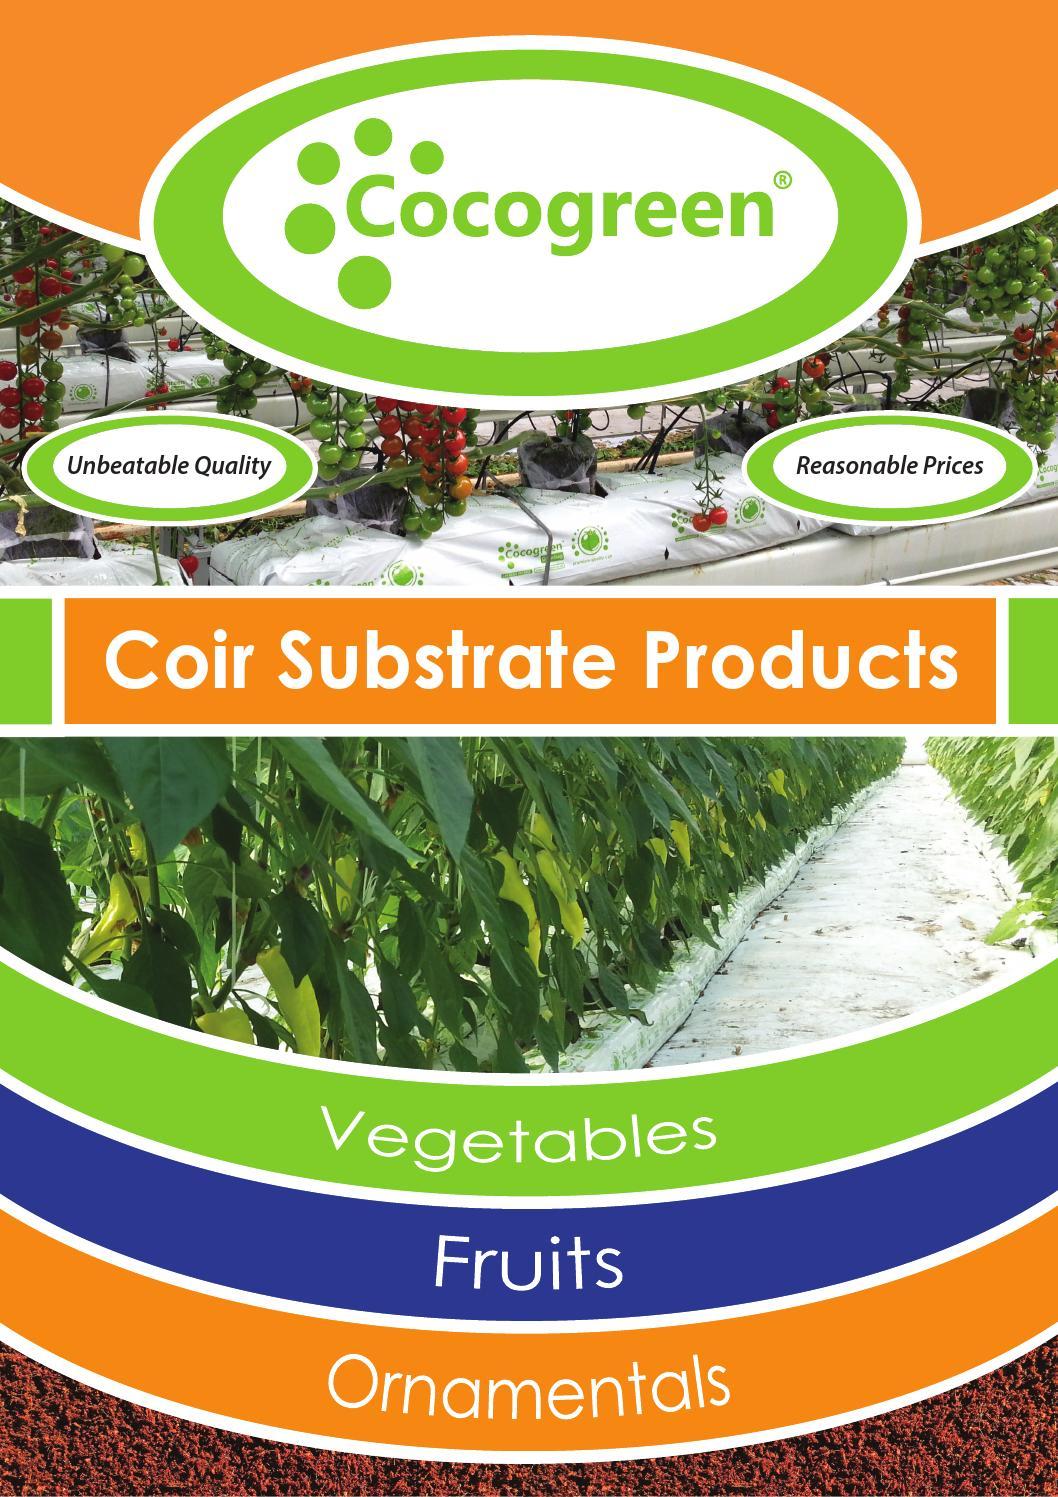 Cocogreen katalogus - Central Europe - English by Cocogreen